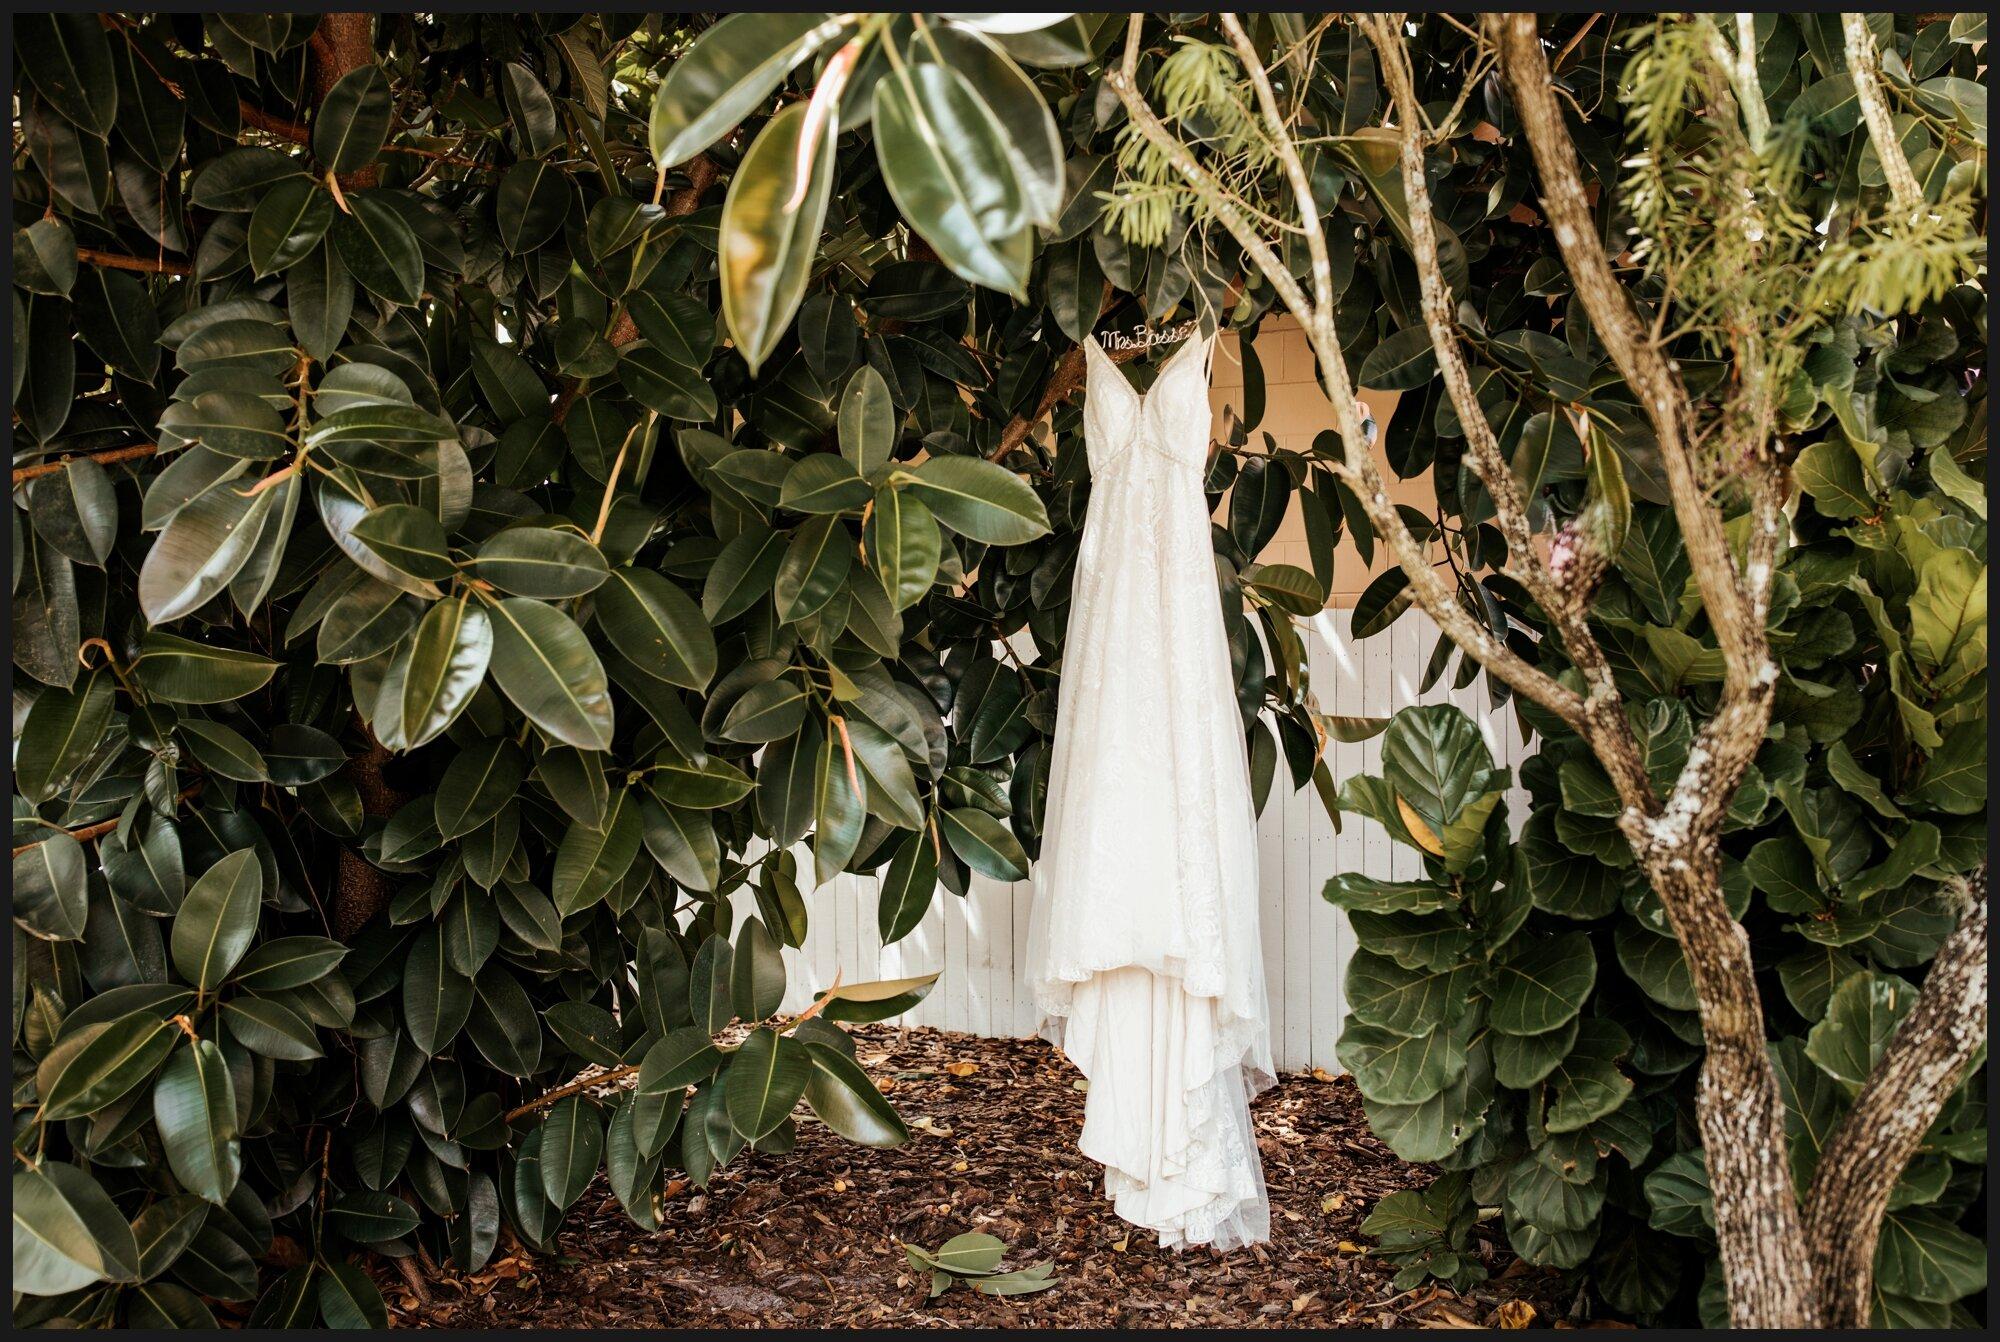 Orlando-Wedding-Photographer-destination-wedding-photographer-florida-wedding-photographer-hawaii-wedding-photographer_0641.jpg